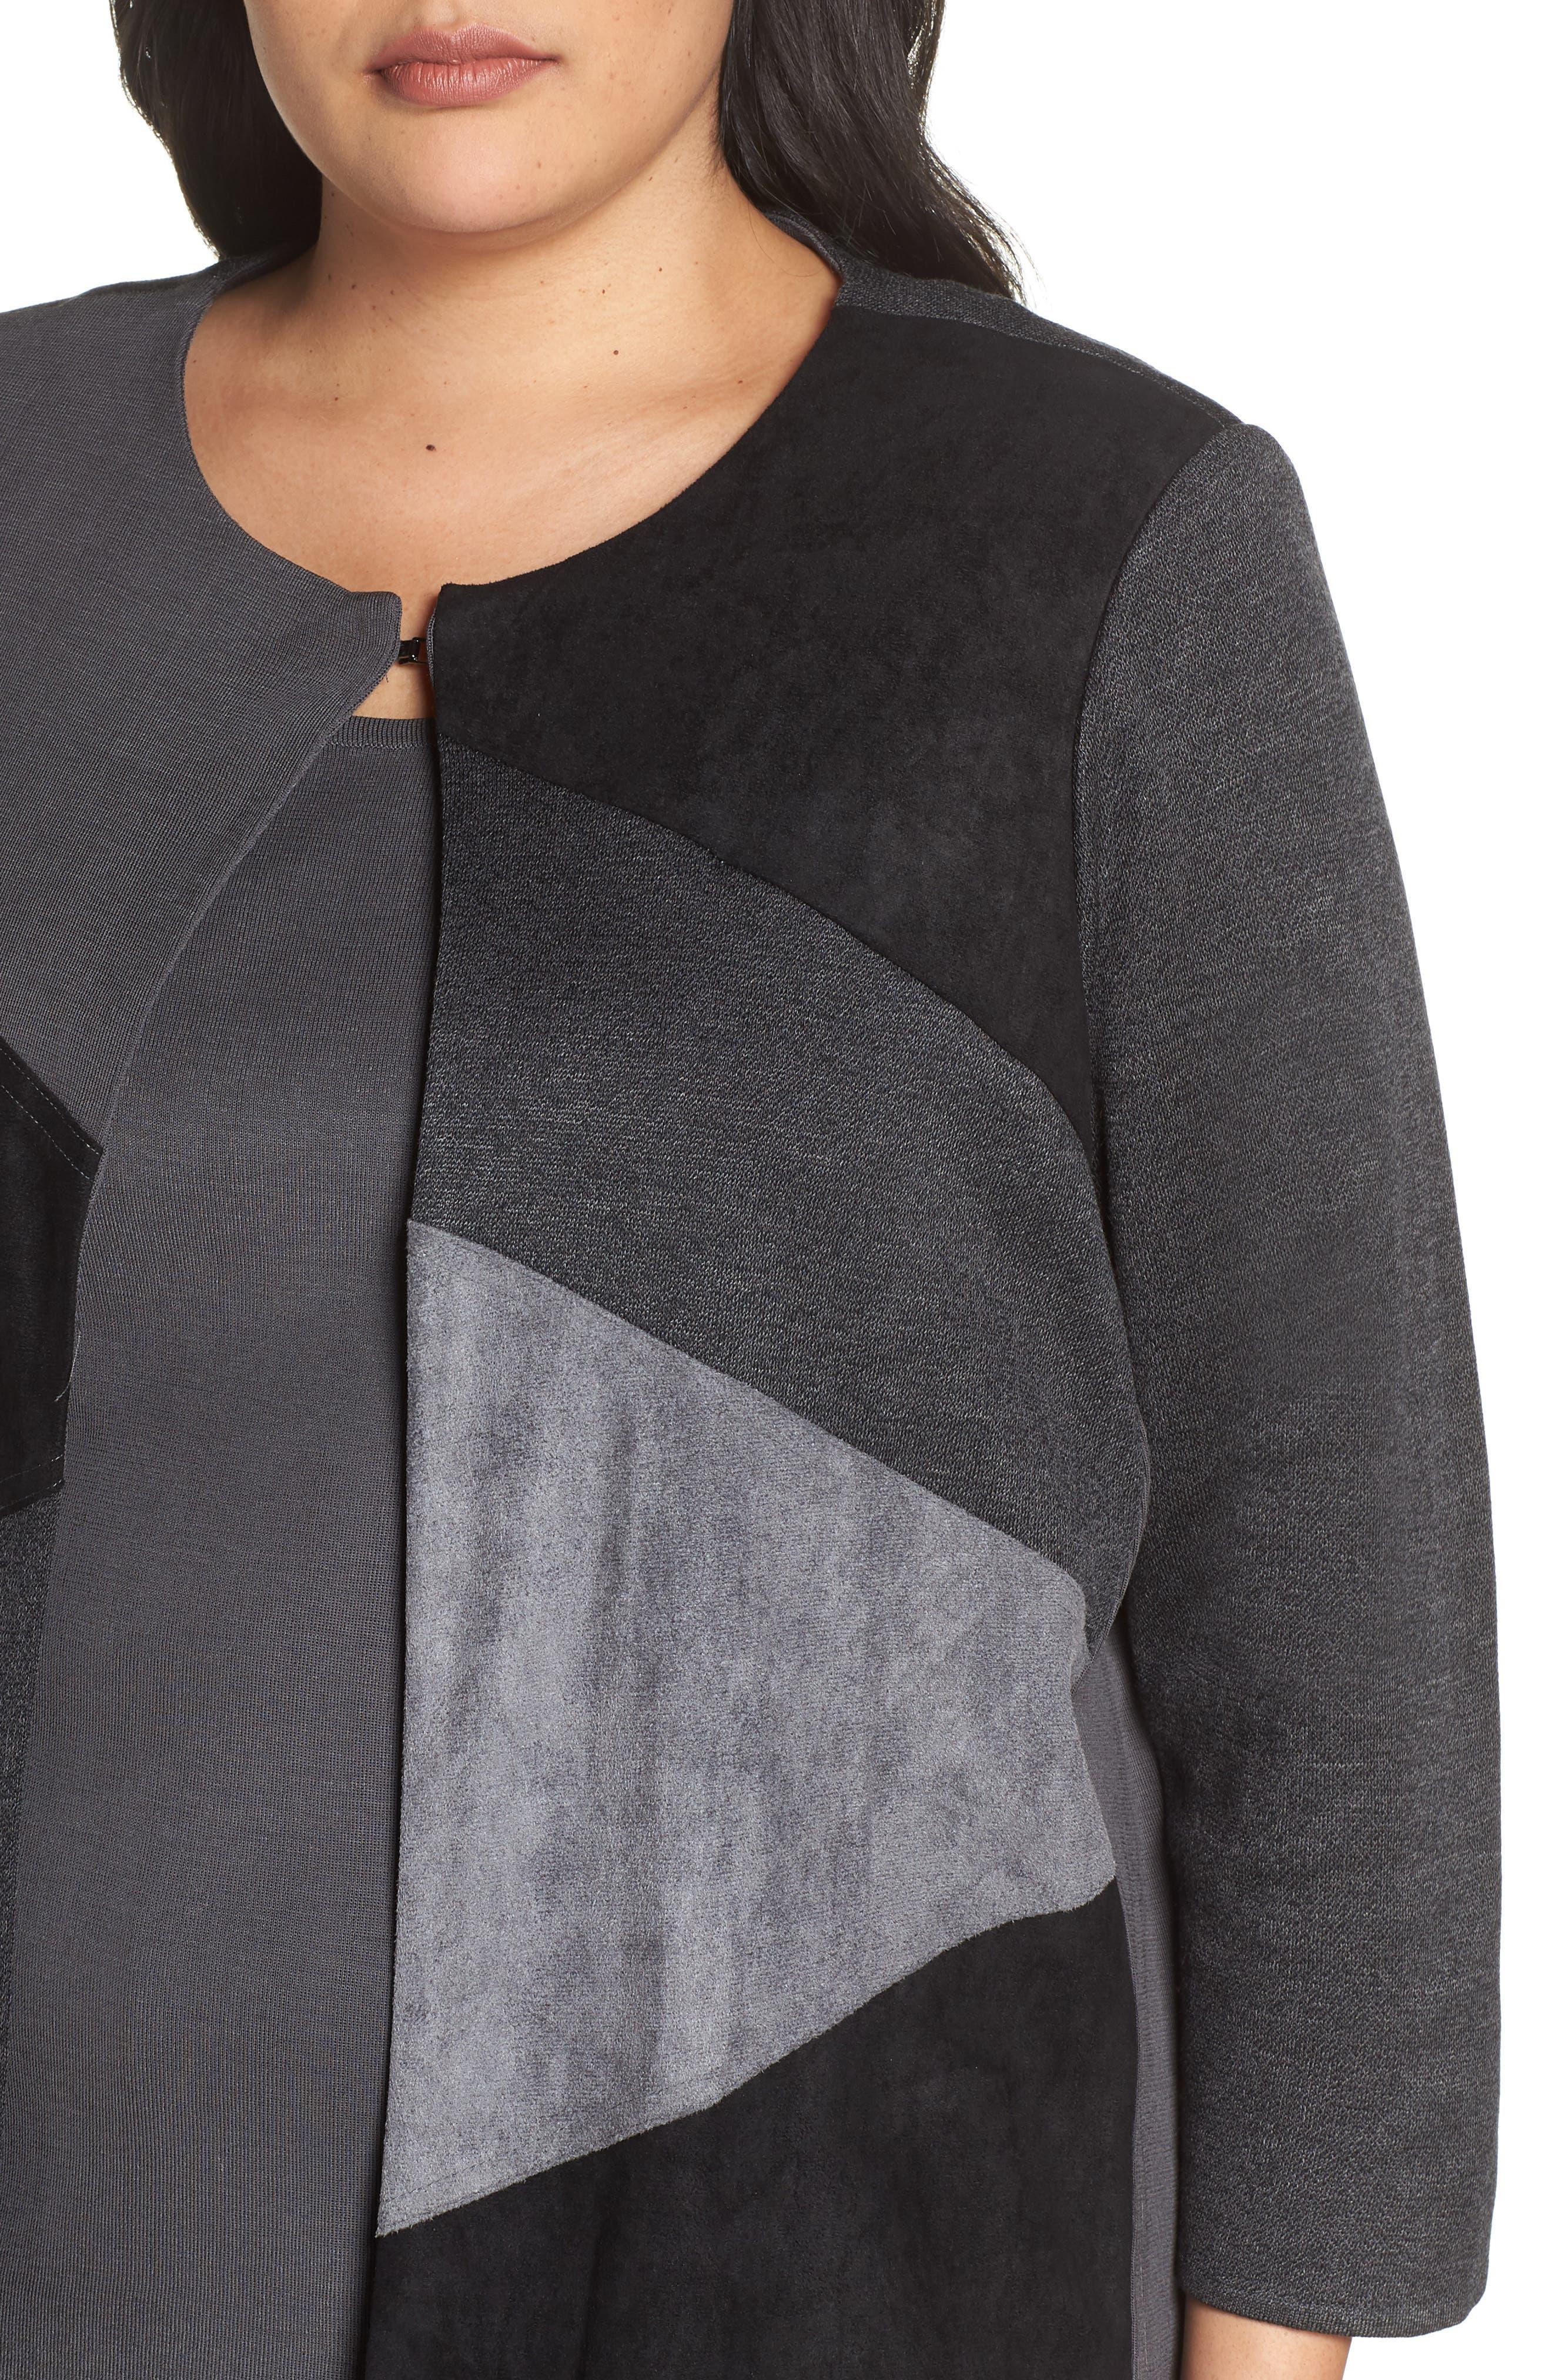 MING WANG, Colorblock Knit Jacket, Alternate thumbnail 5, color, BLACK/ GRANITE